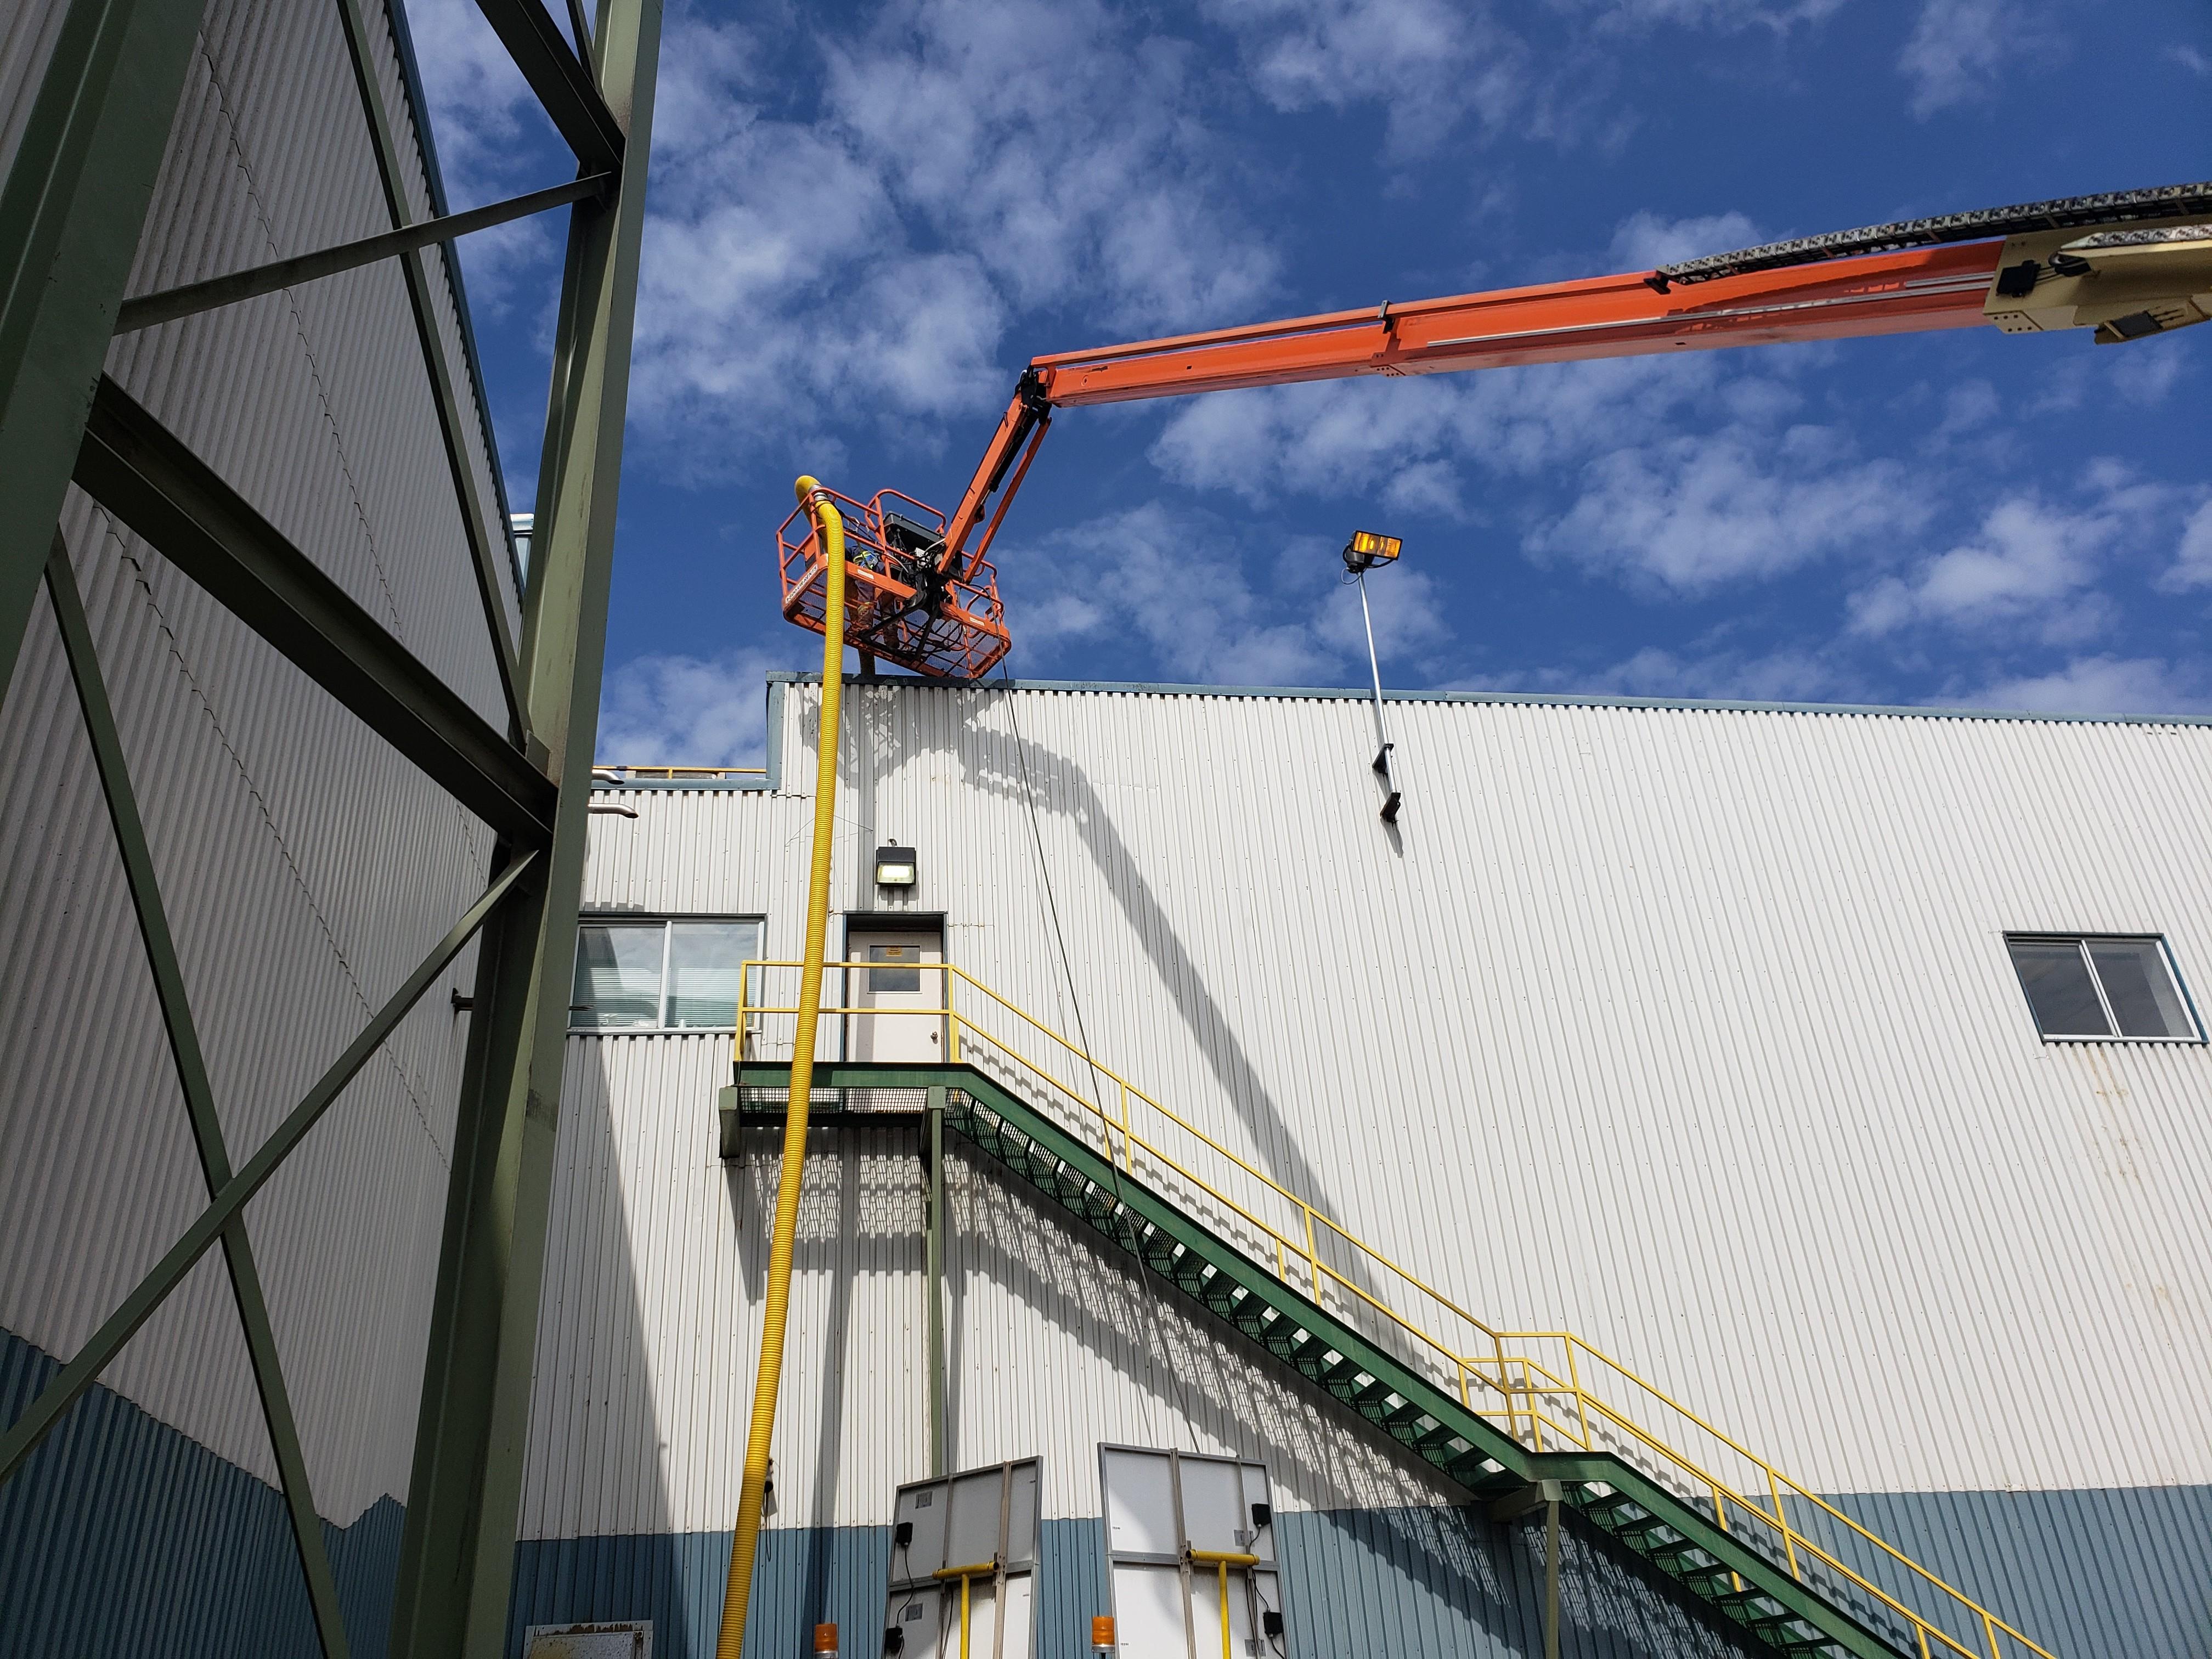 Commercial Debris Removal